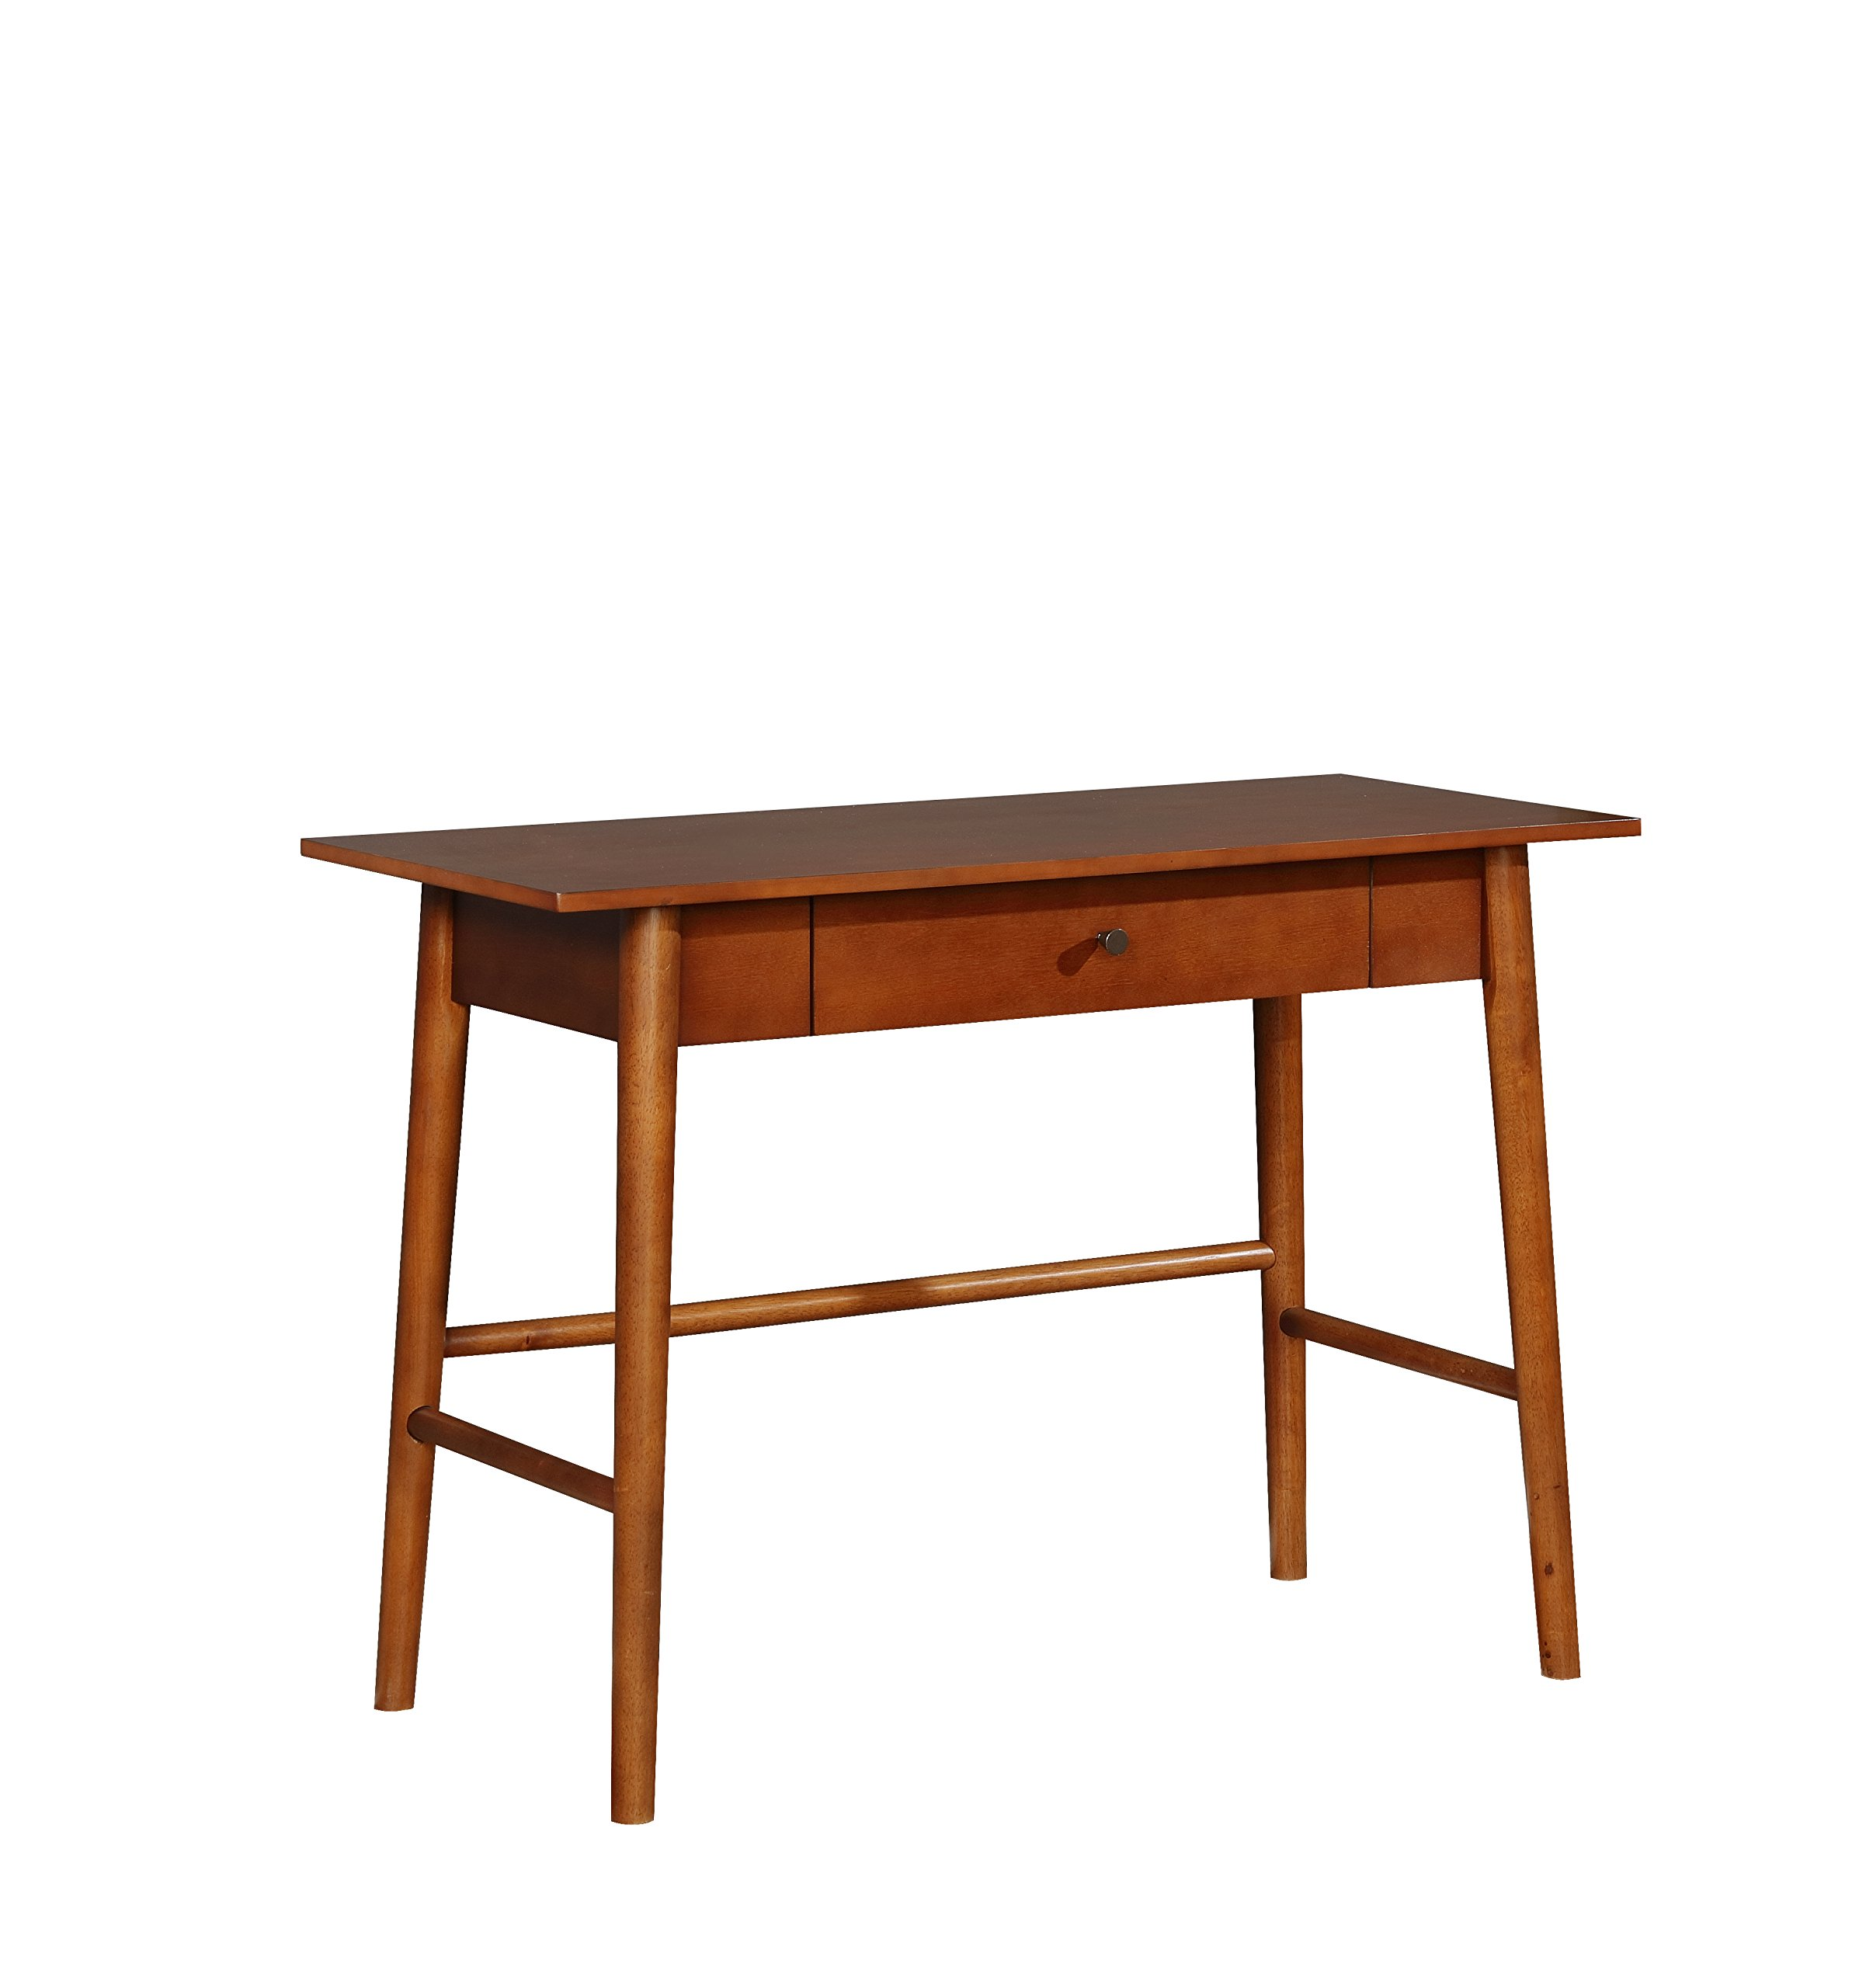 Linon CG135BIR01U Desk, Walnut by Linon